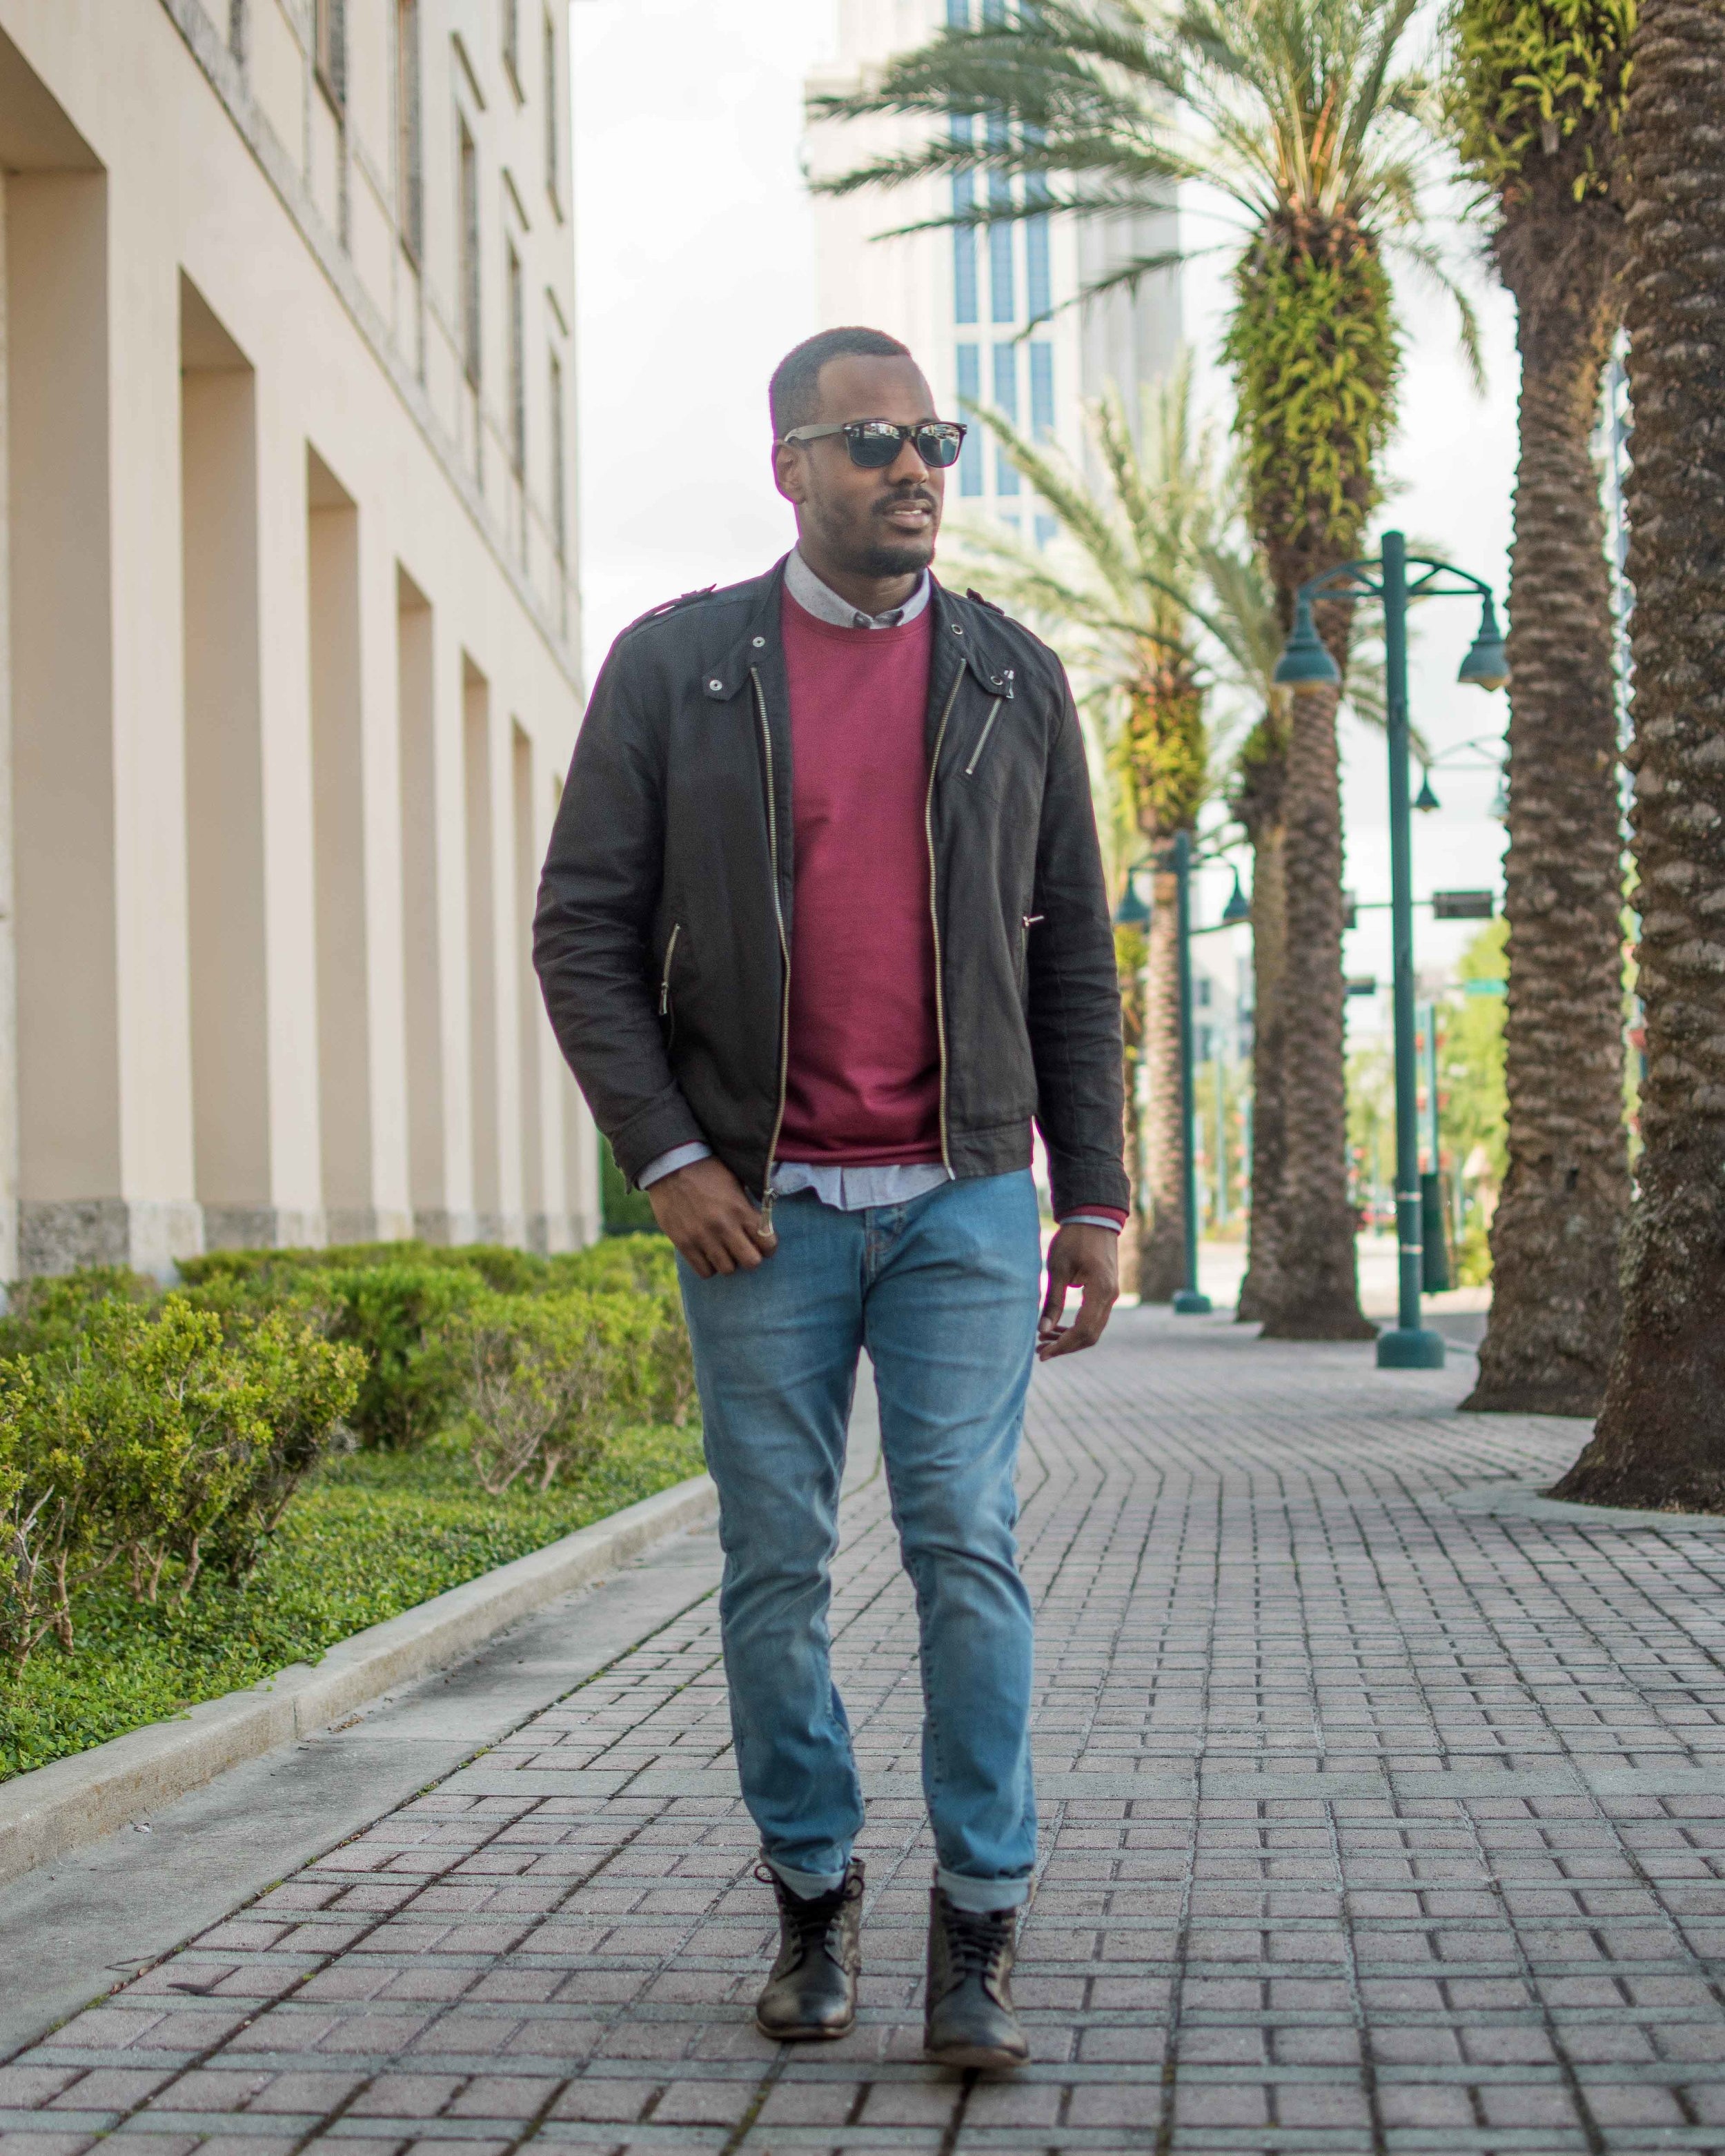 lindbergh sweater shirt jacket mens fashion spring 2018 greg mcgregorson